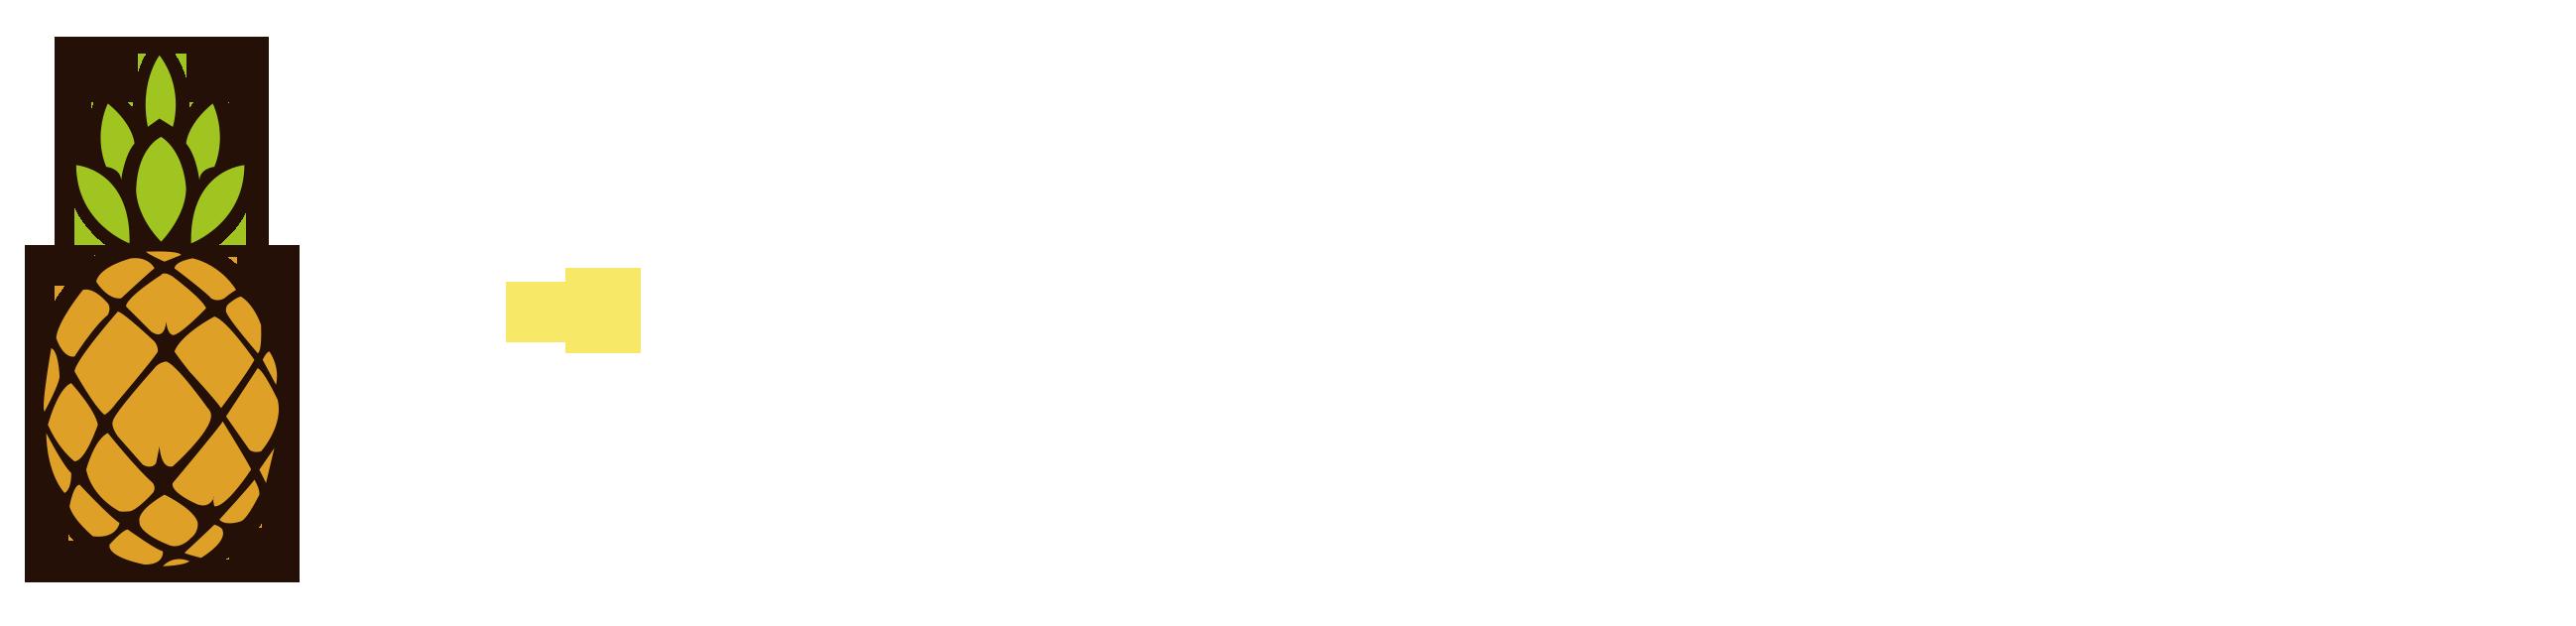 Pineapplexpress